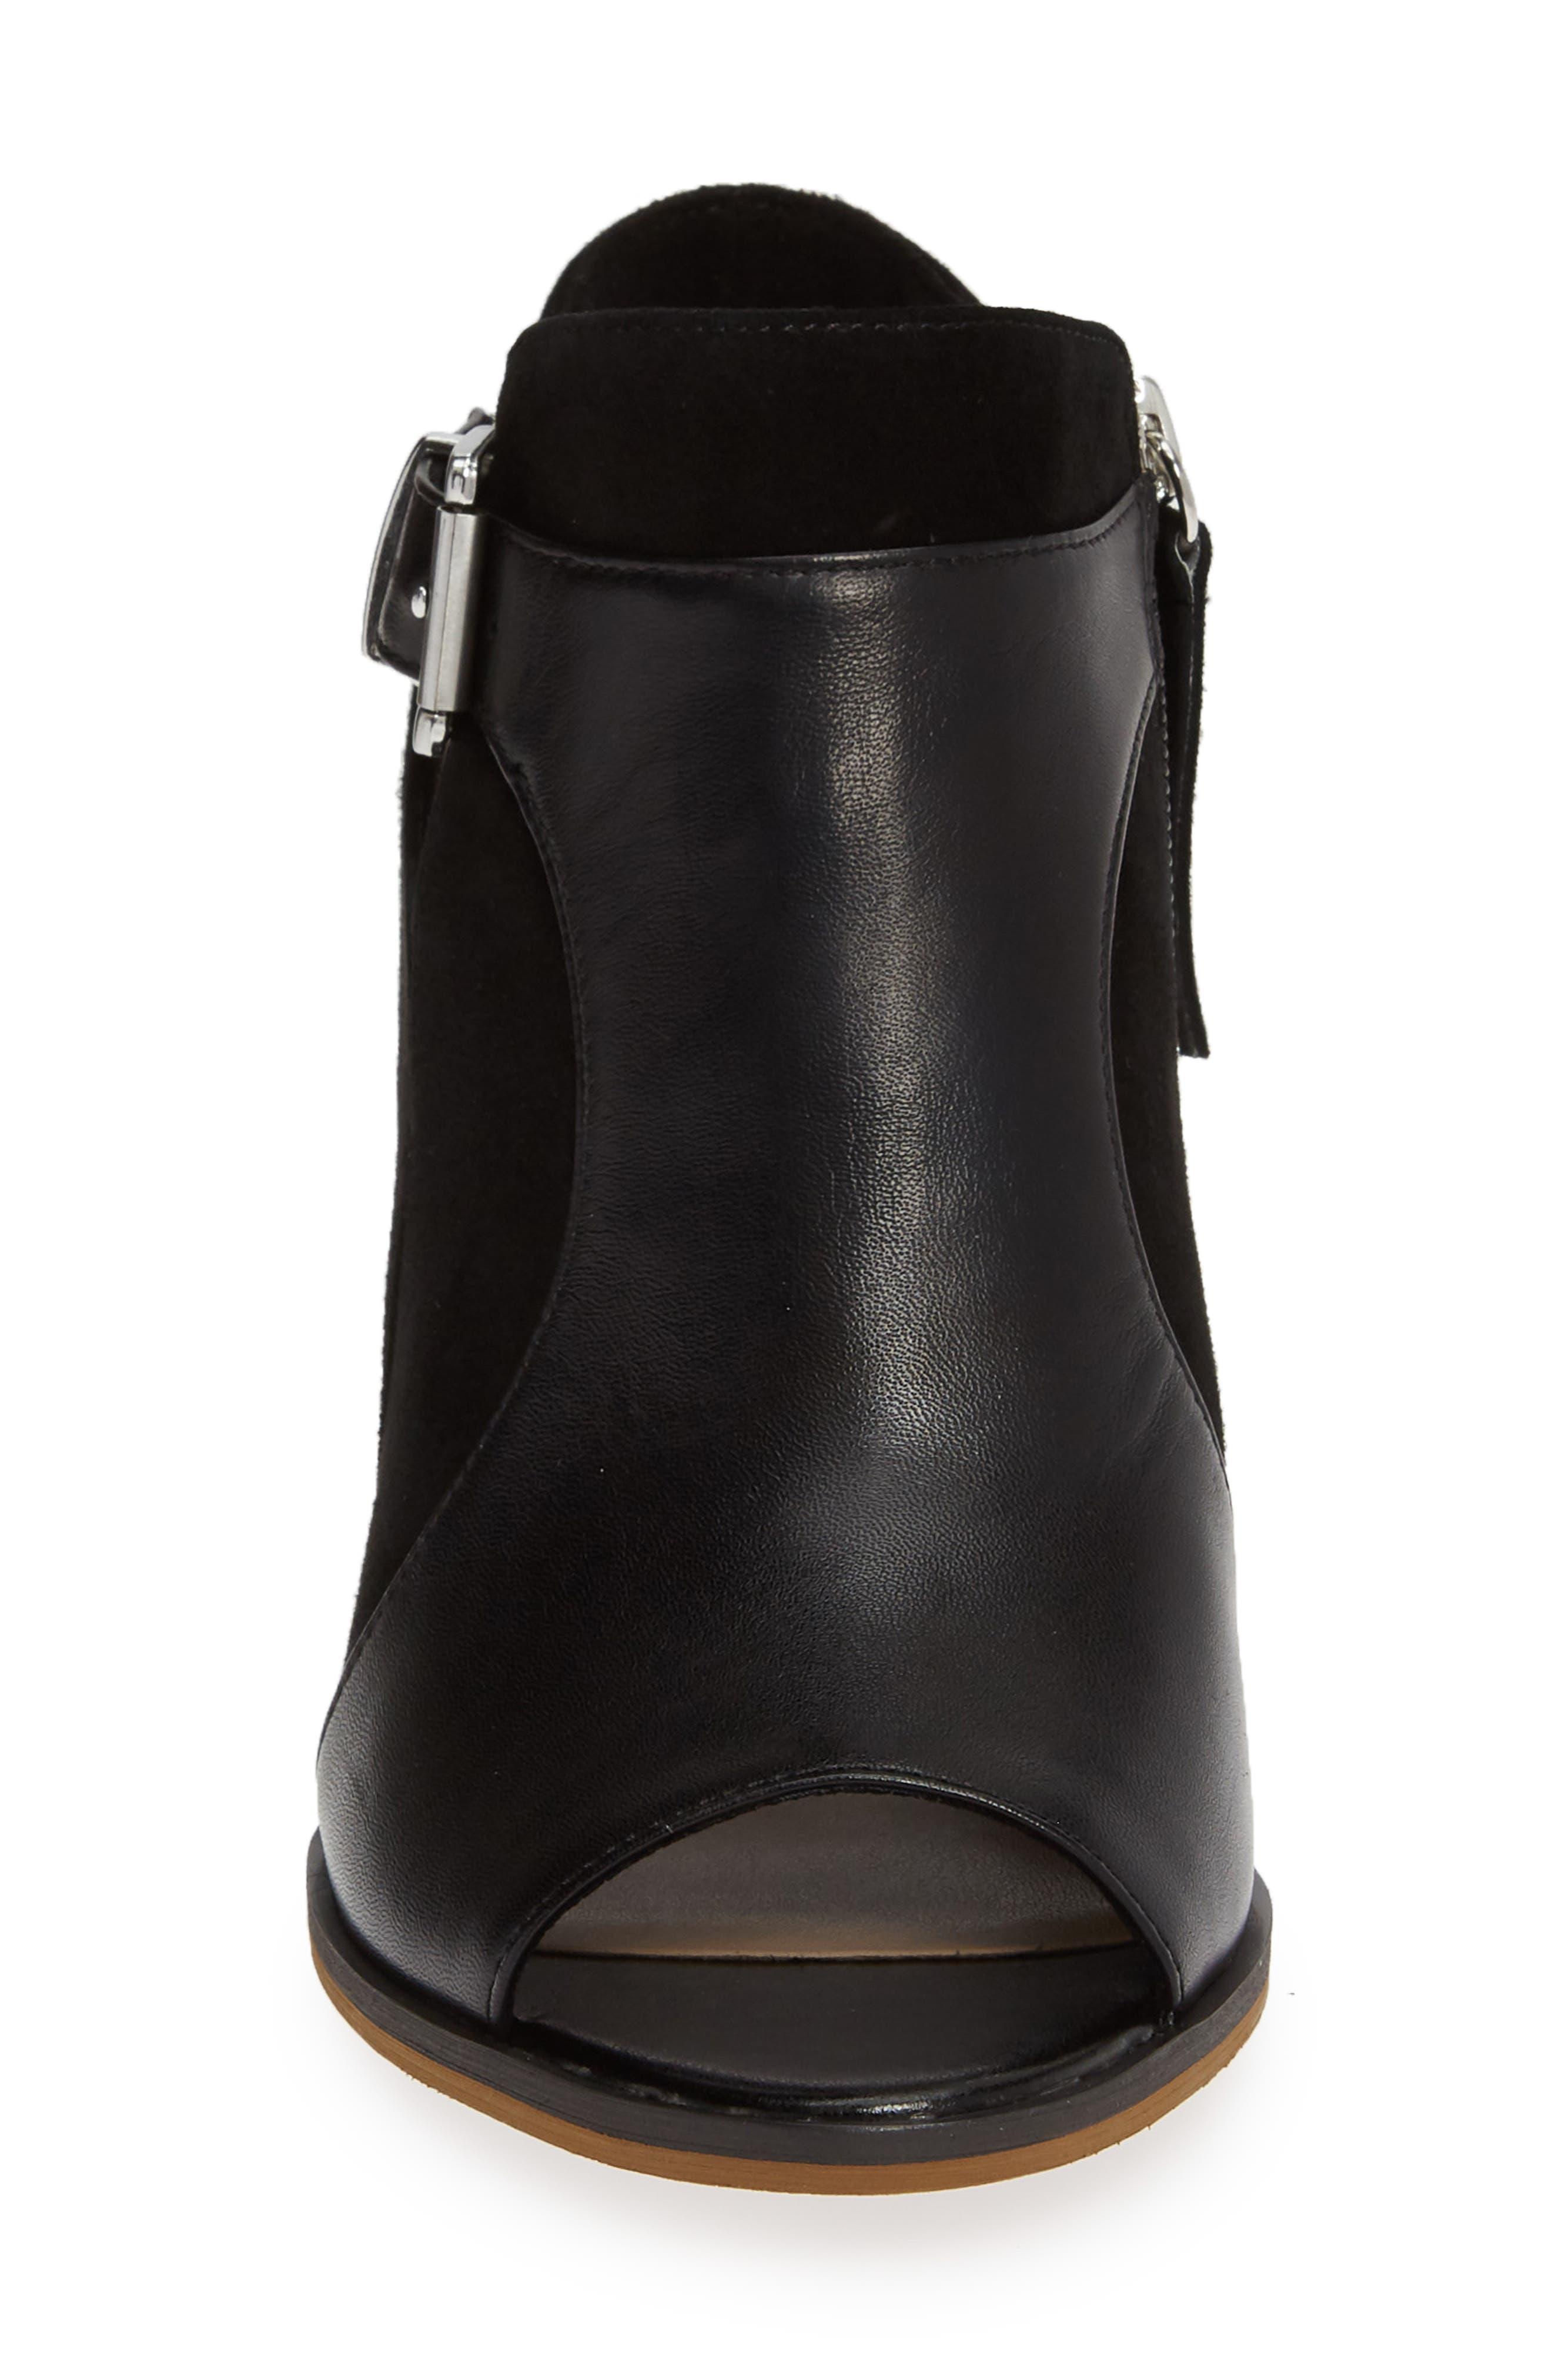 BELLA VITA, Kellan Mixed Finish Sandal, Alternate thumbnail 4, color, BLACK LEATHER/ SUEDE